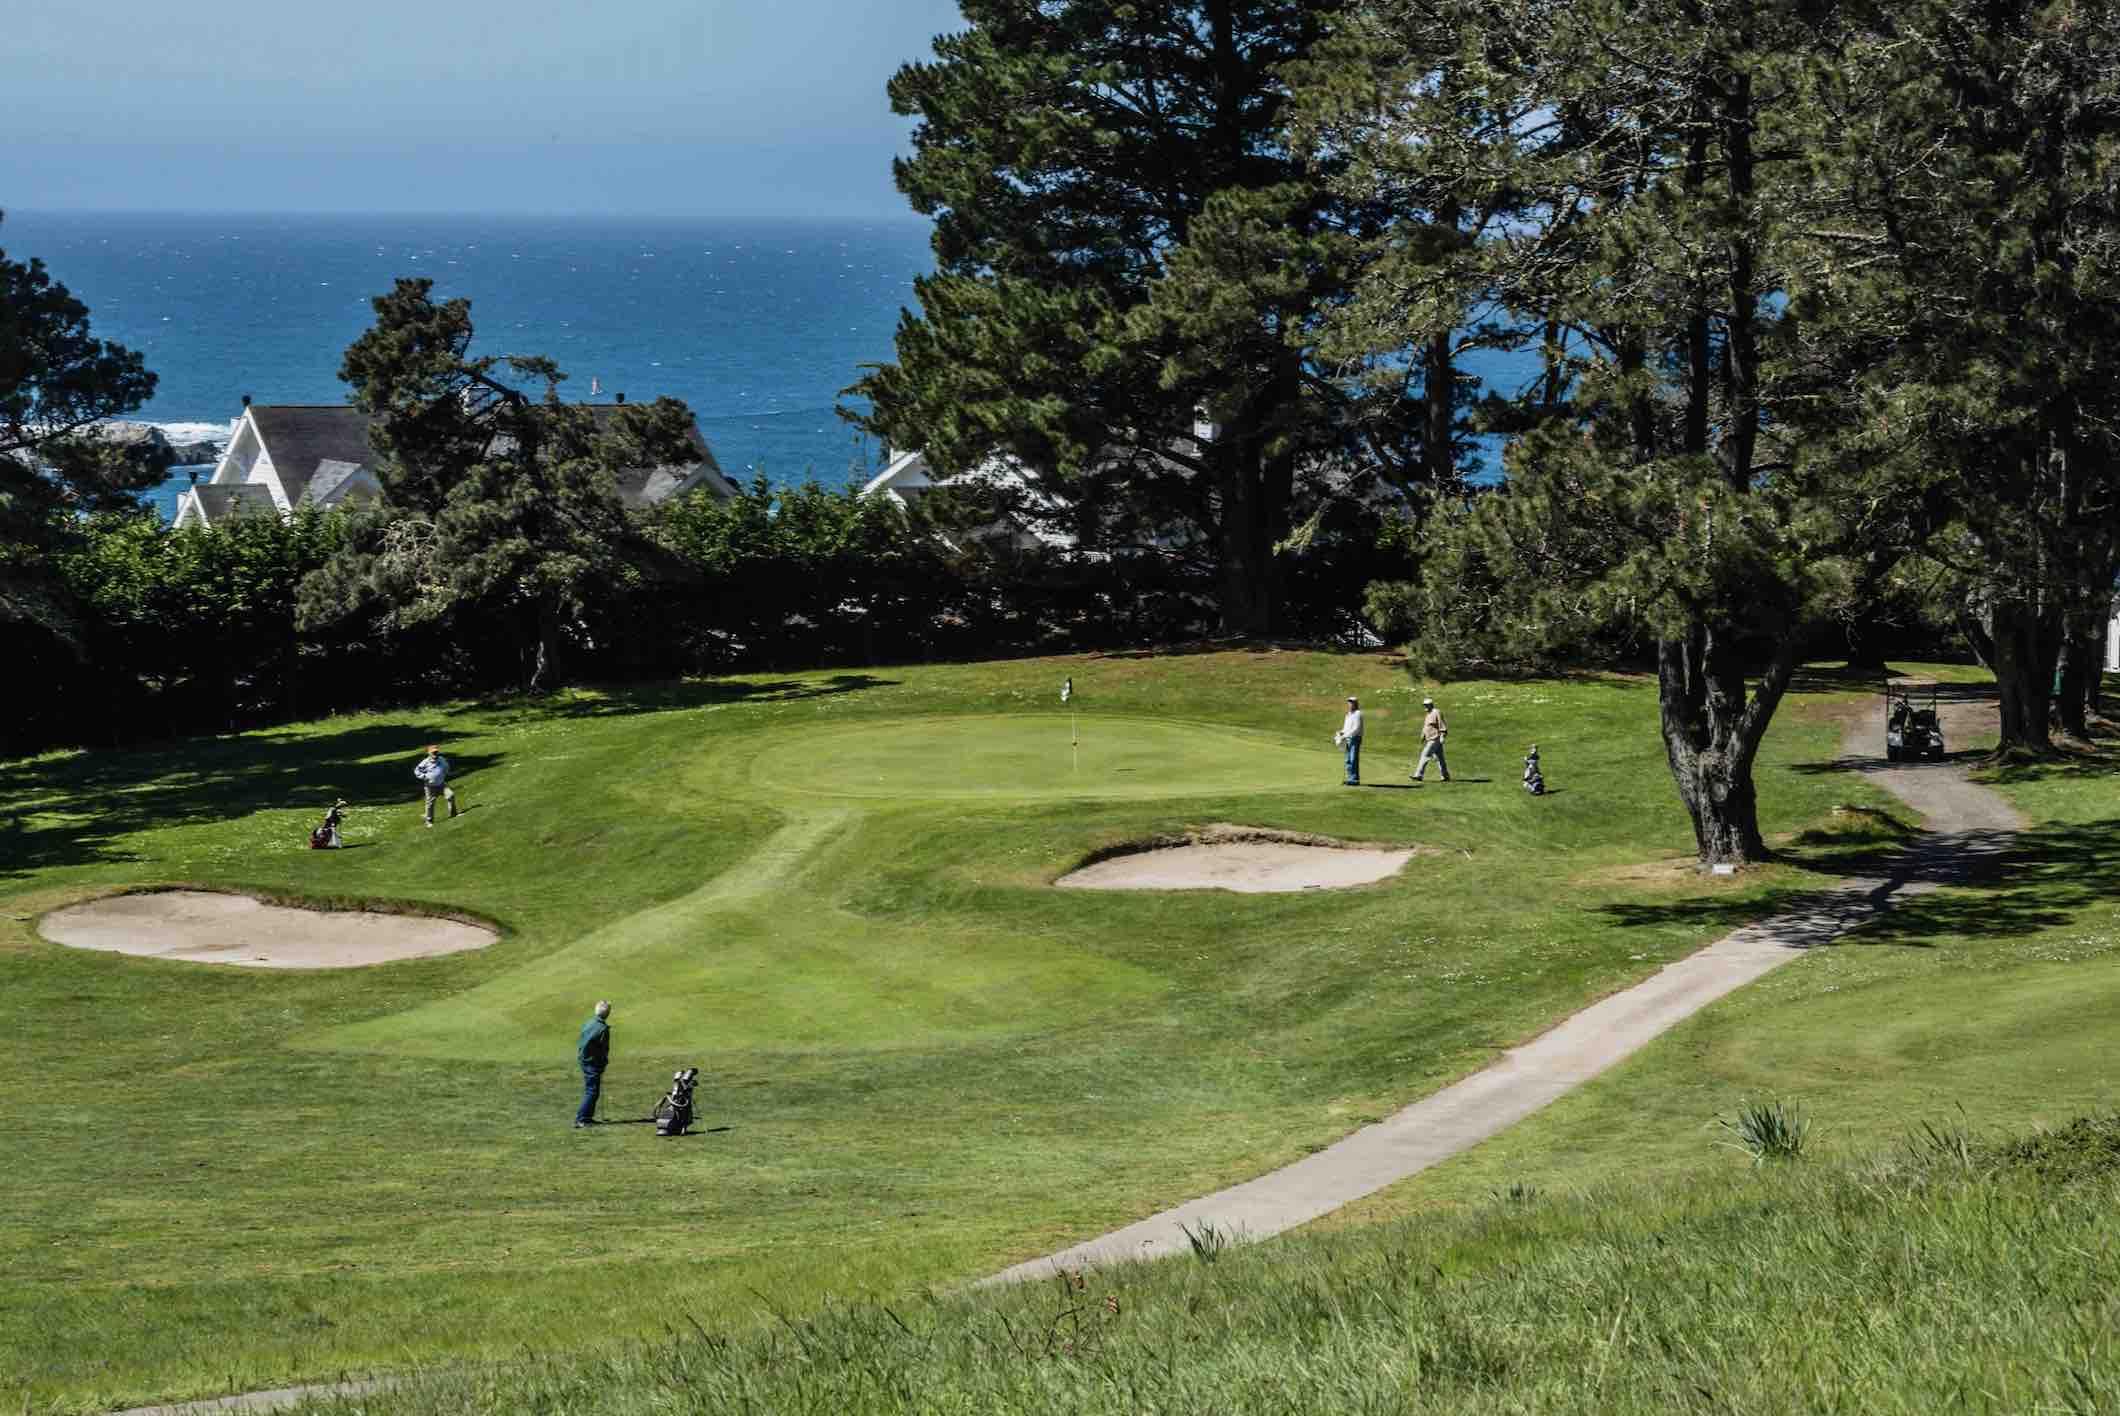 Looking Down the Little River Inn  Golf Course Towards Ocean - Photo by Brendan McGuigan